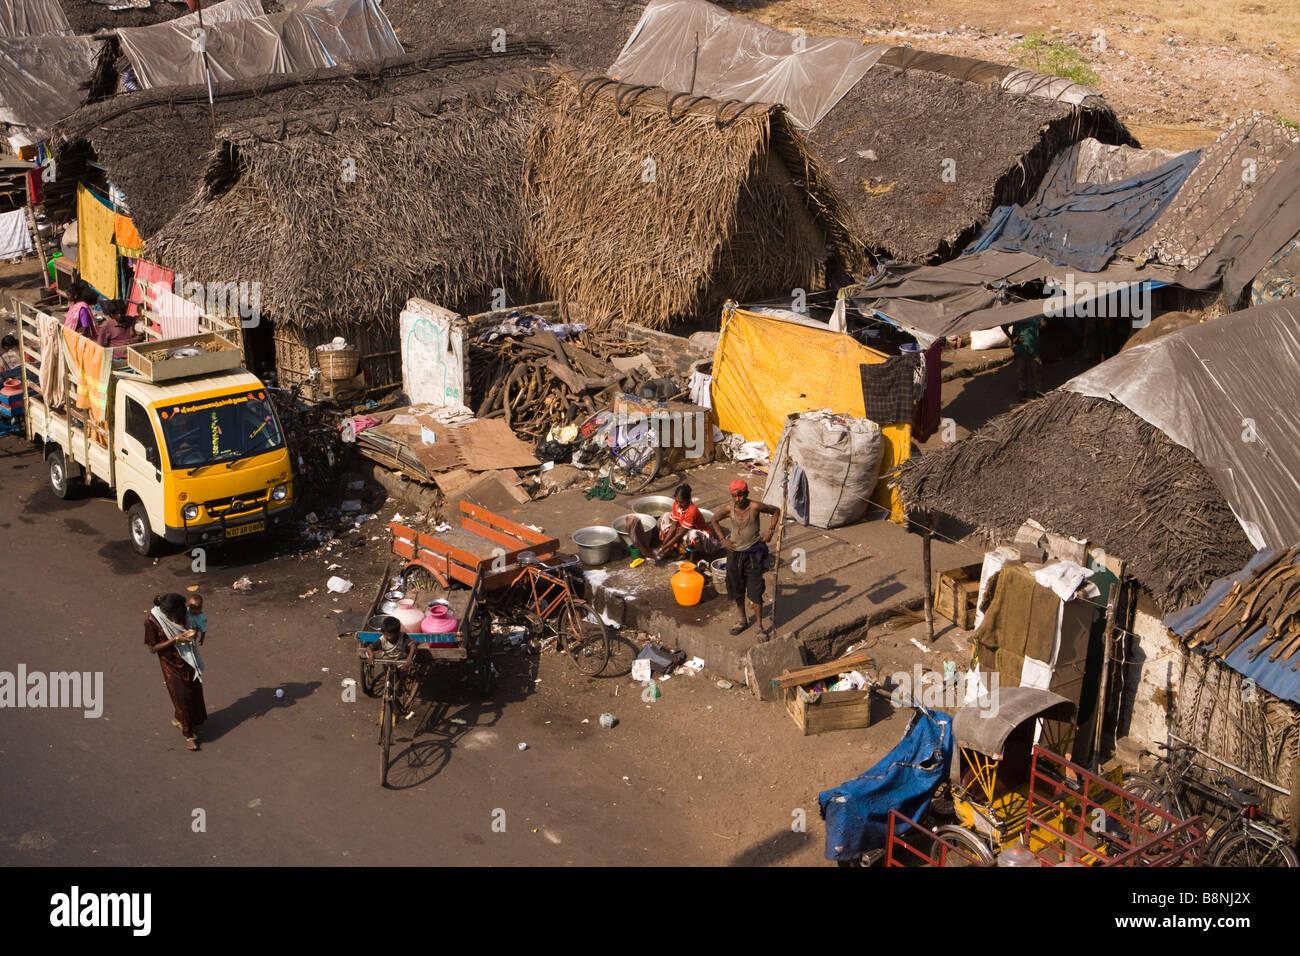 India Tamil Nadu Chennai roadside shanty temporary housing in city centre - Stock Image